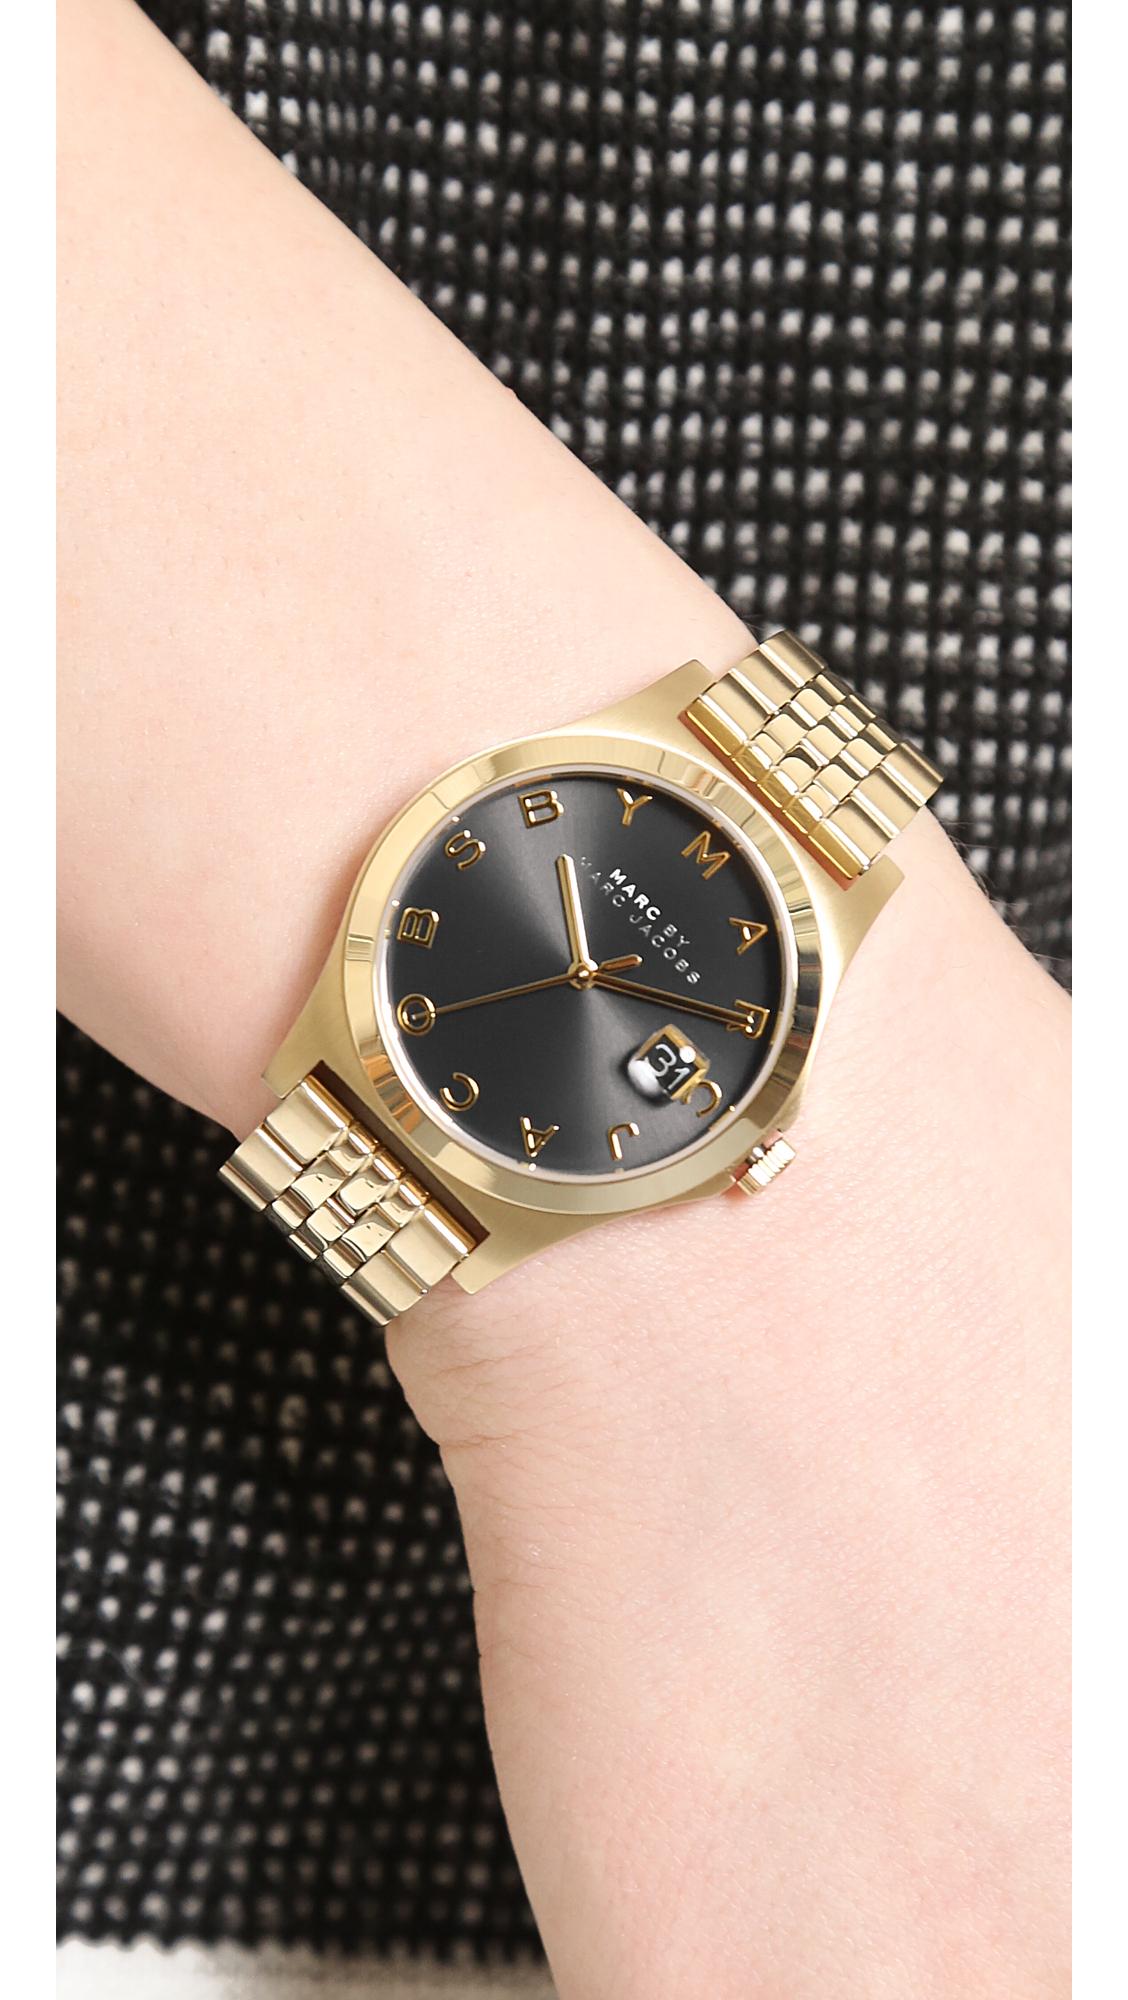 da56bb9dcecdb Marc By Marc Jacobs The Slim Watch - Gold/Black in Metallic - Lyst